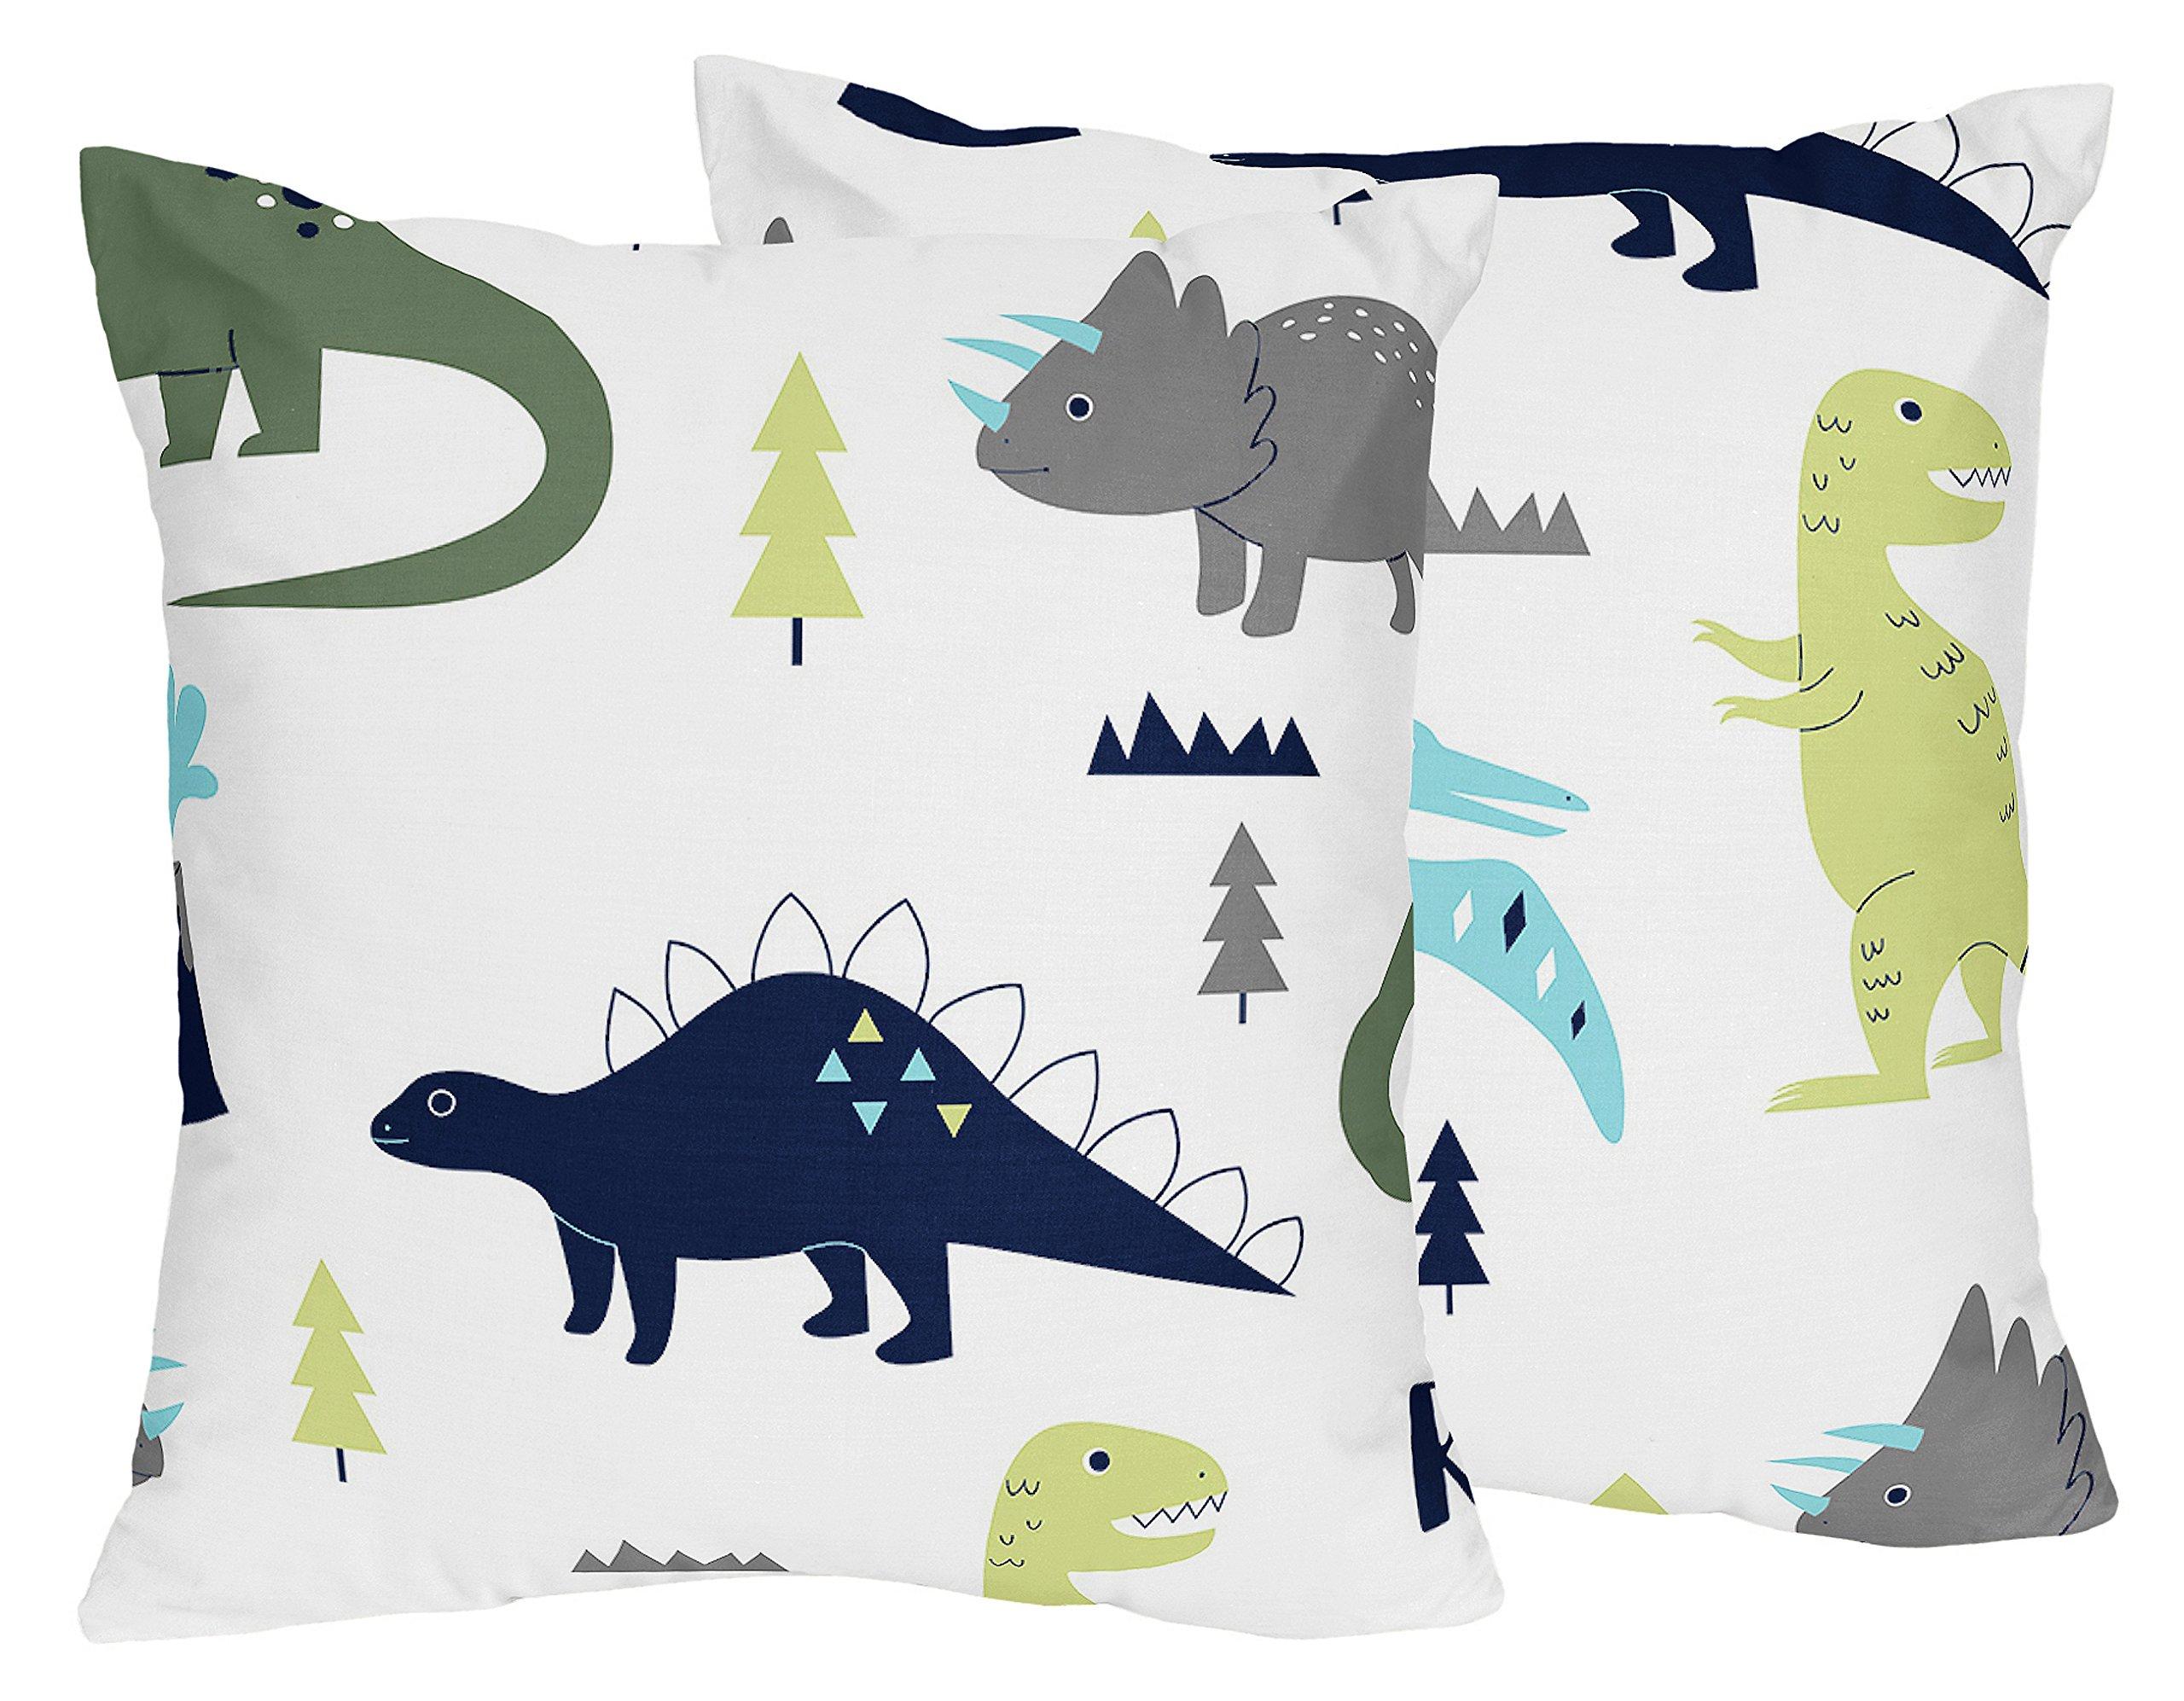 Sweet Jojo Designs 2-Piece Blue and Green Modern Dinosaur Decorative Accent Throw Pillows